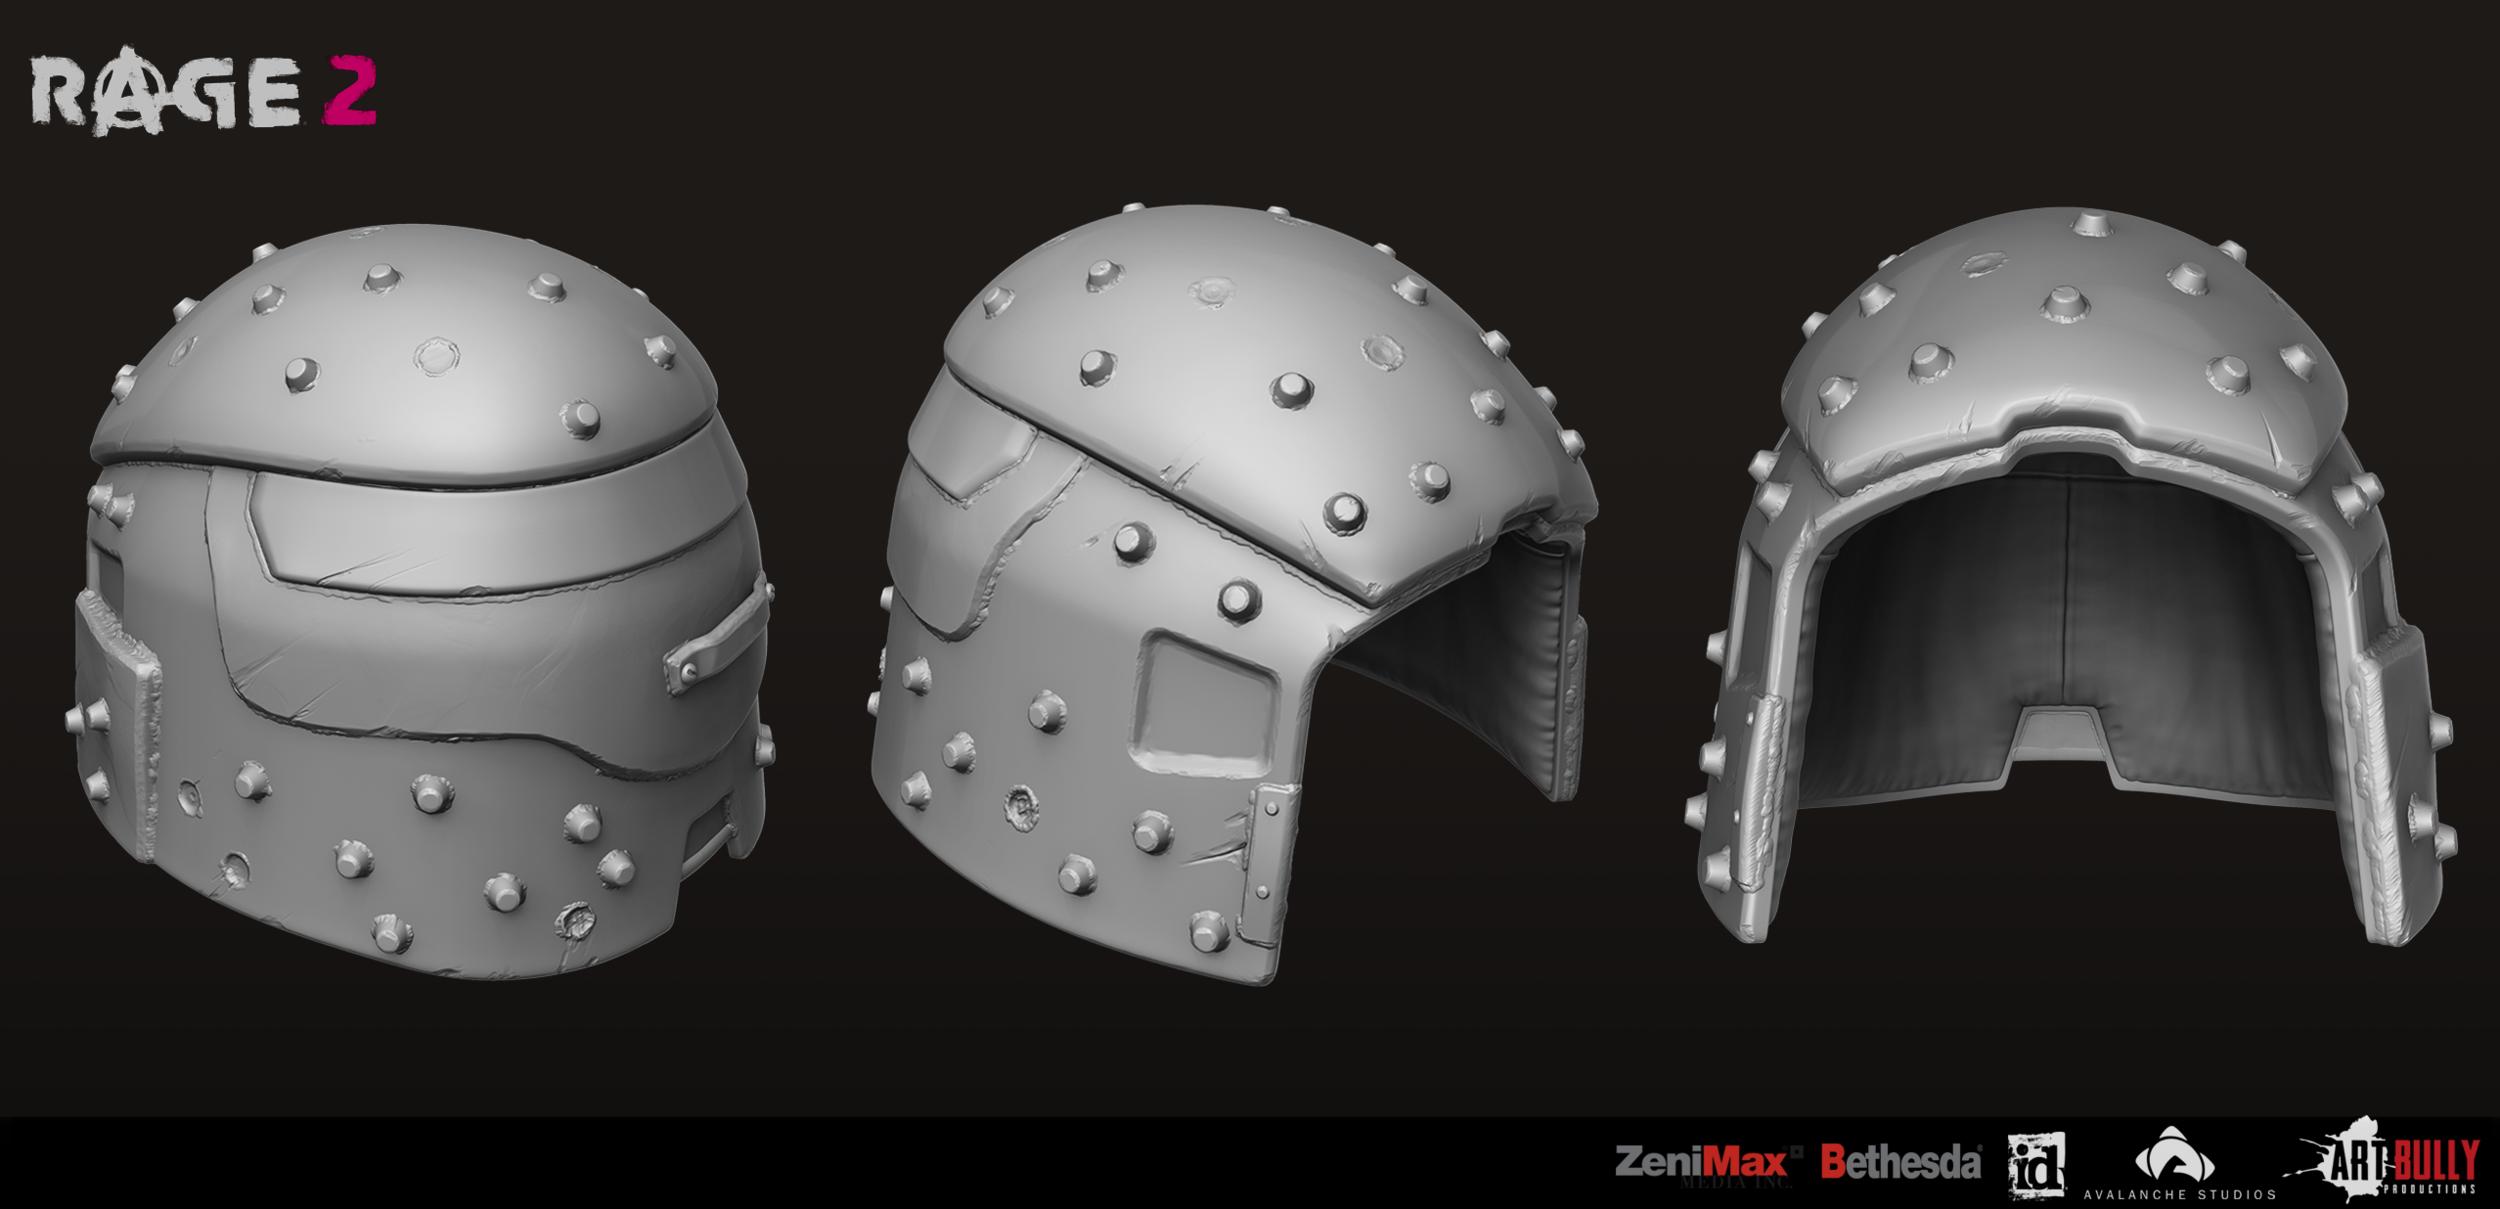 Goon_Shielder_Helmet_render.png